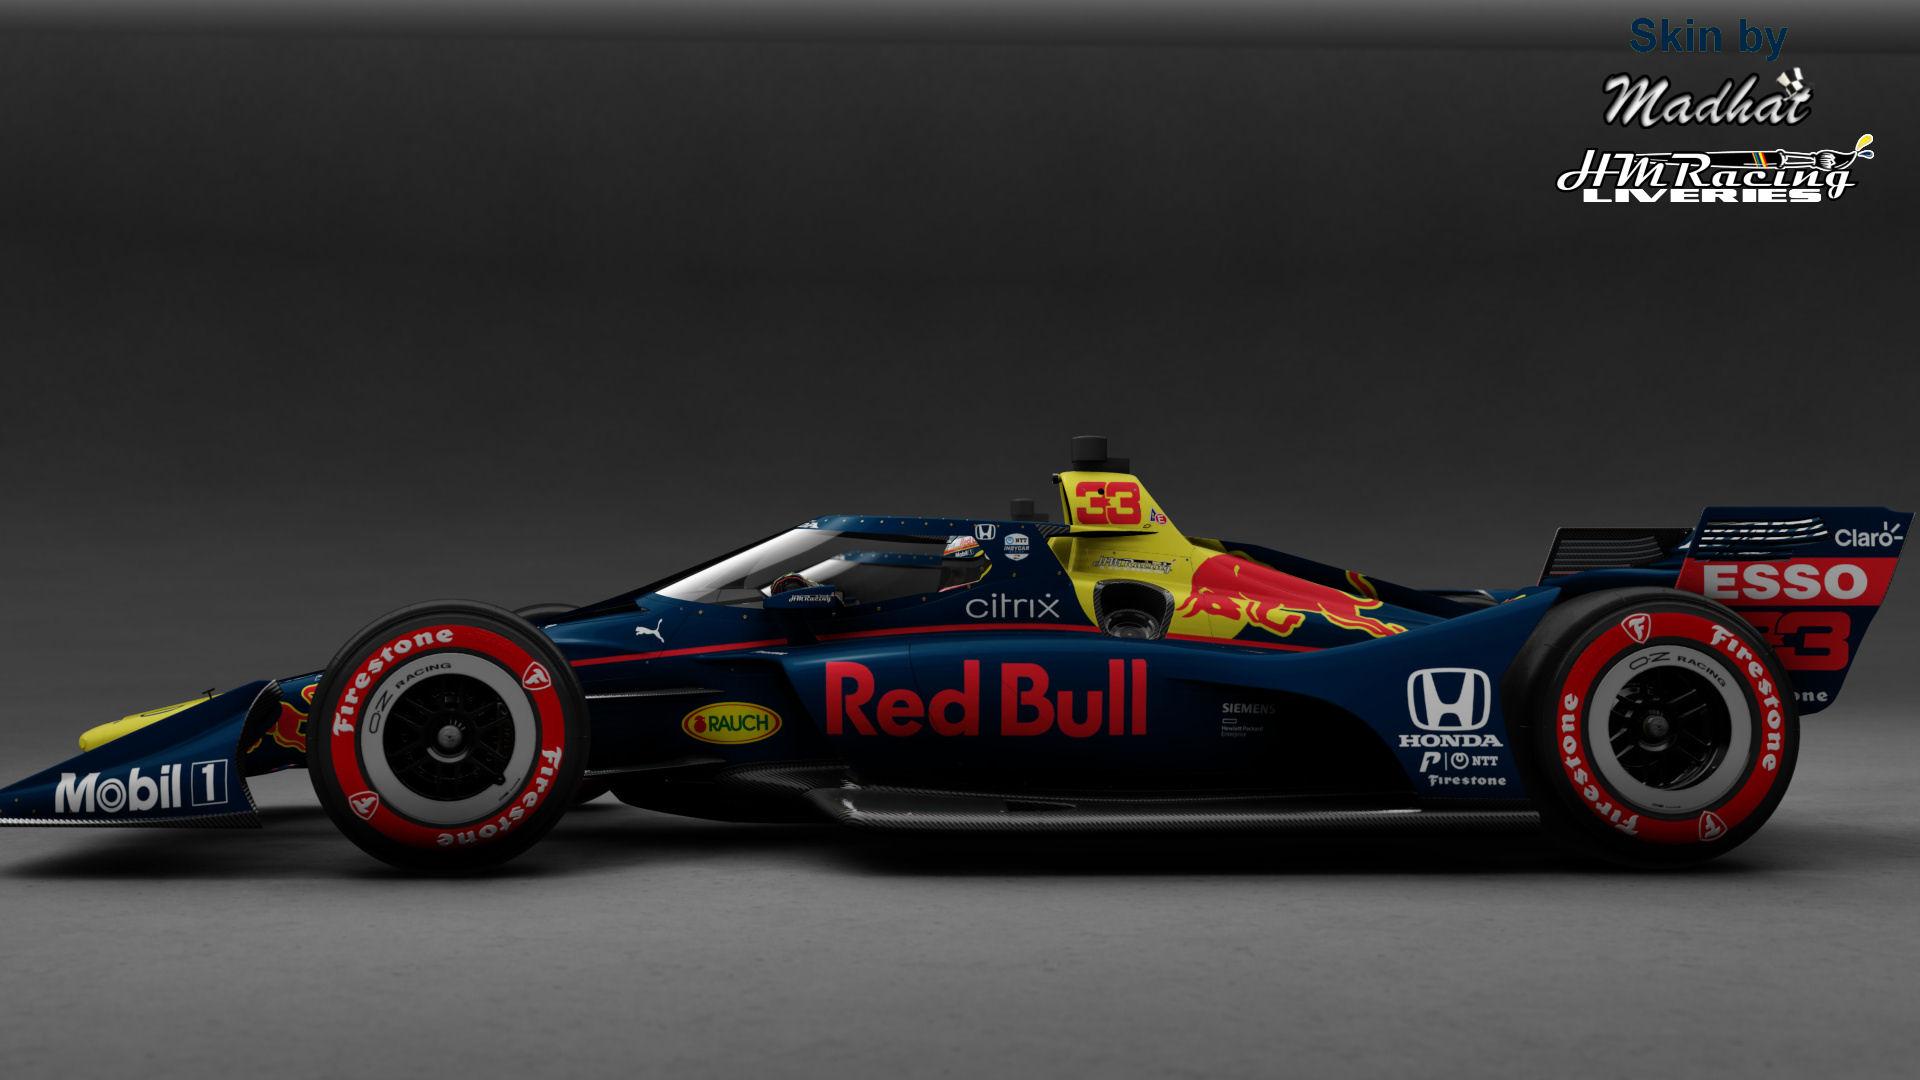 RED BULL 33 Matte IndyCar Madhat HMRacing Liveries 03.jpg